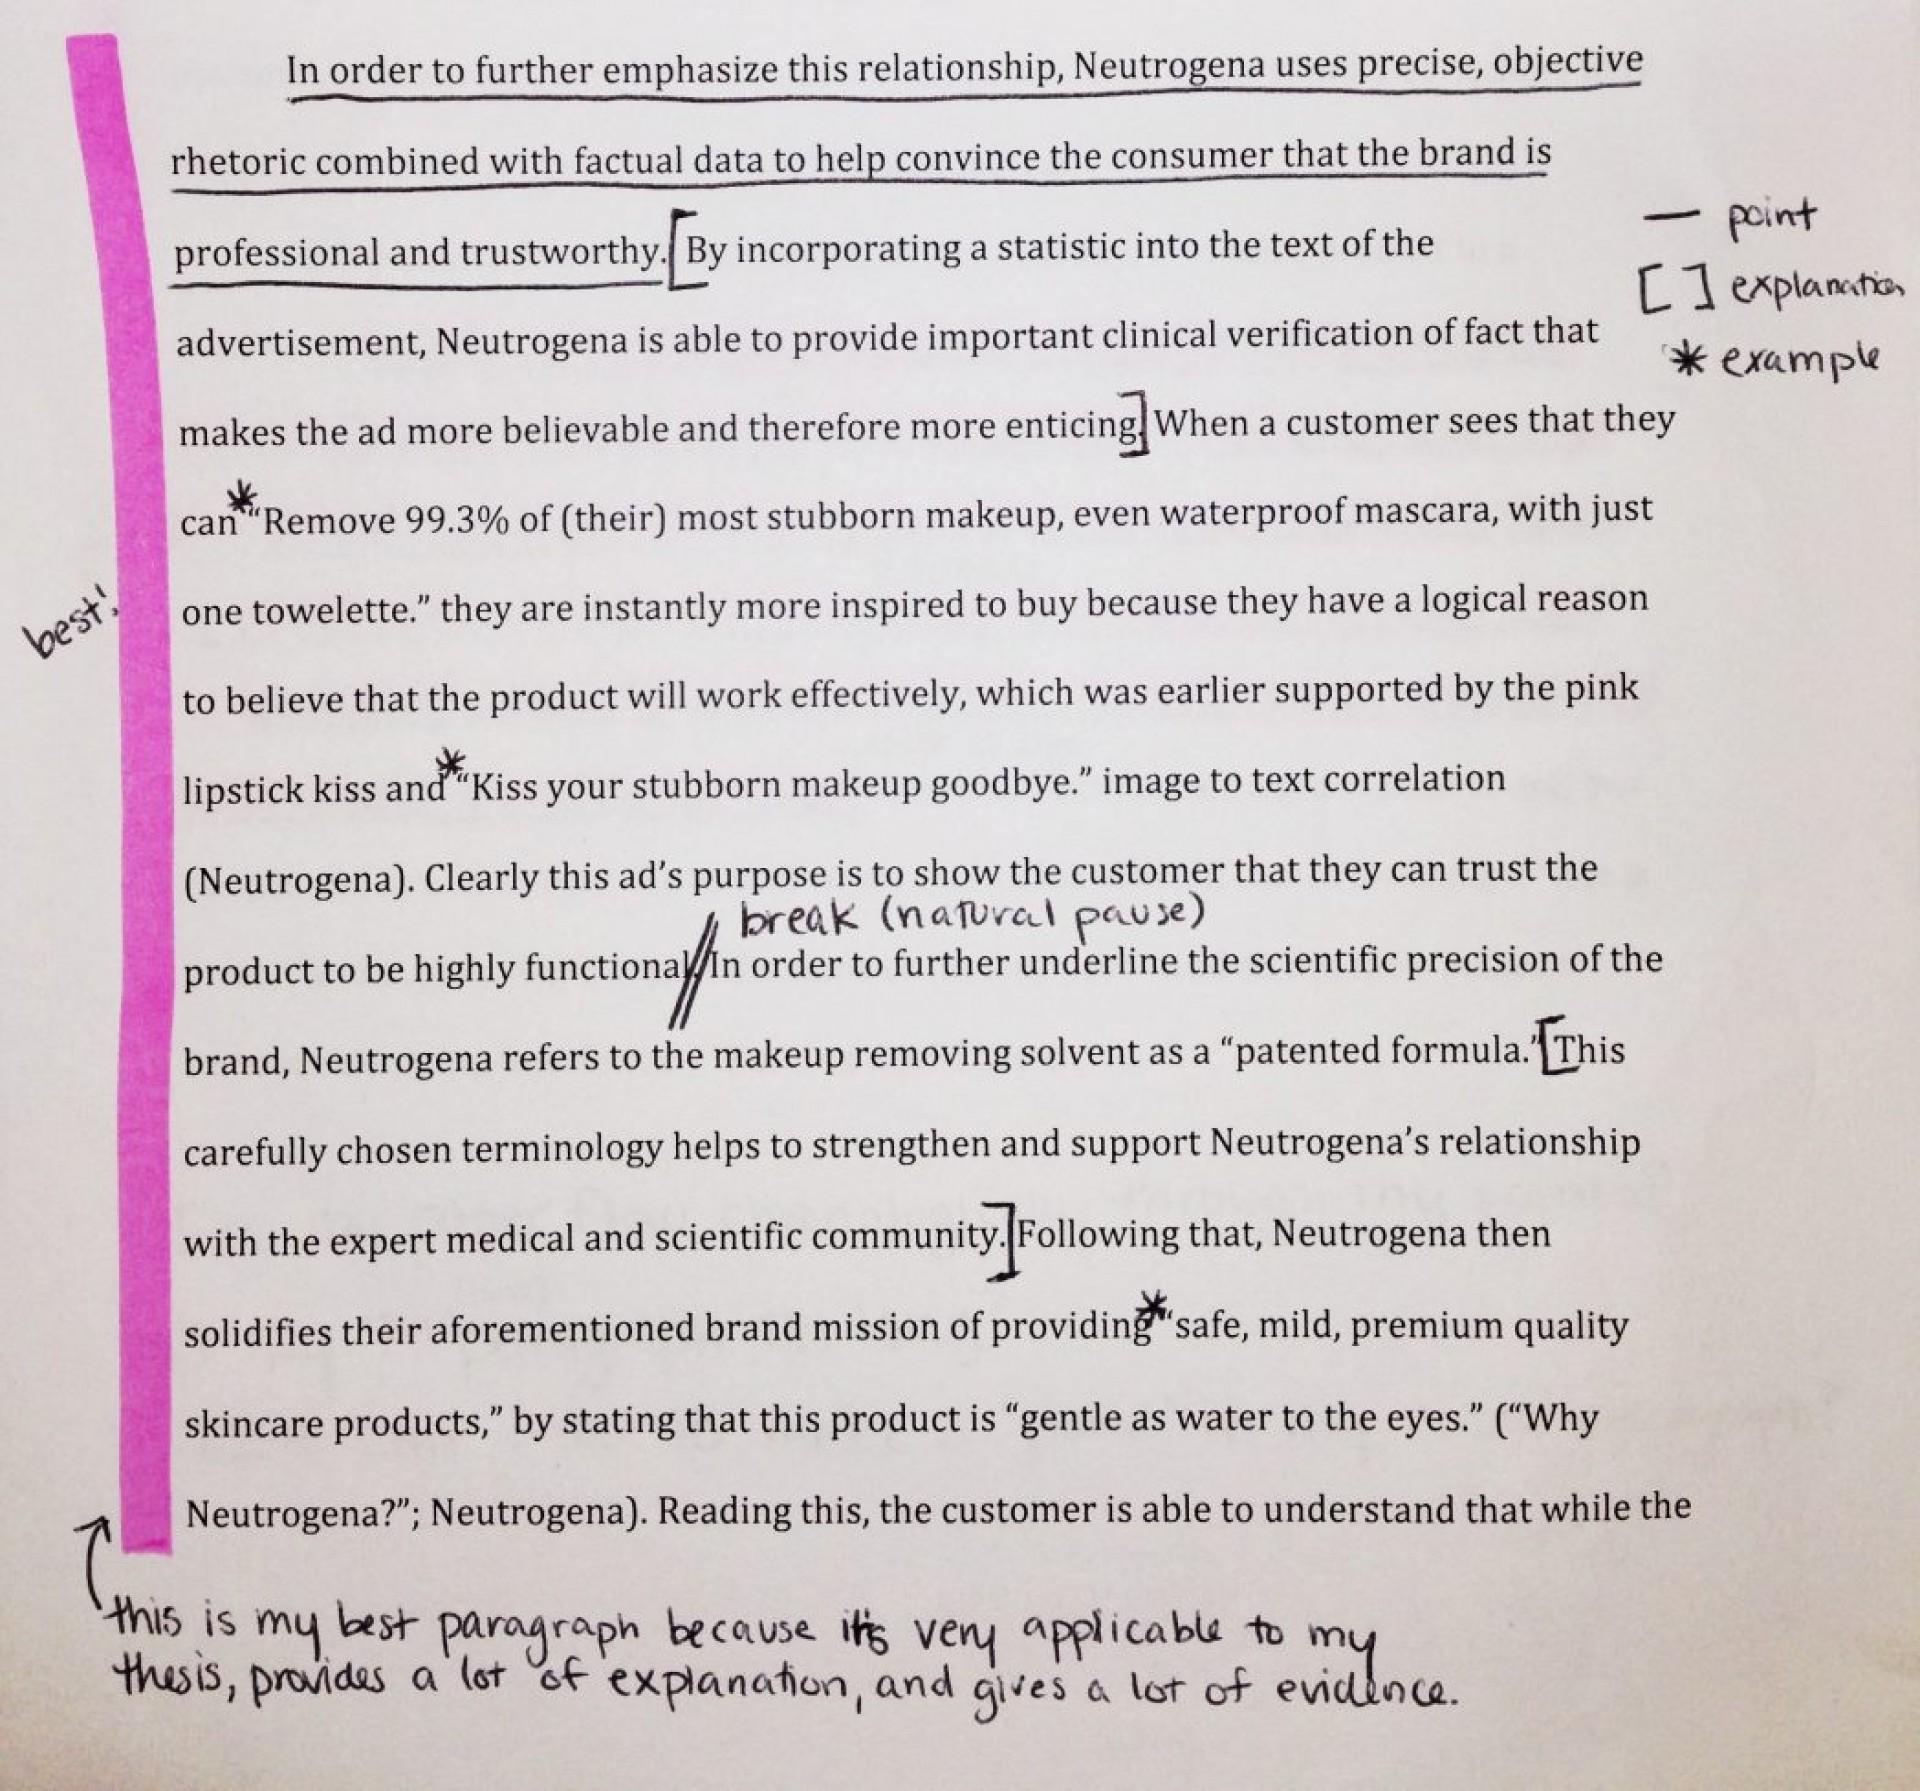 016 Essay Example Visual Rhetoric Of Rhetorical Essays Template Ph Analysis Examples Topics Shocking Response Literacy Arts 1920